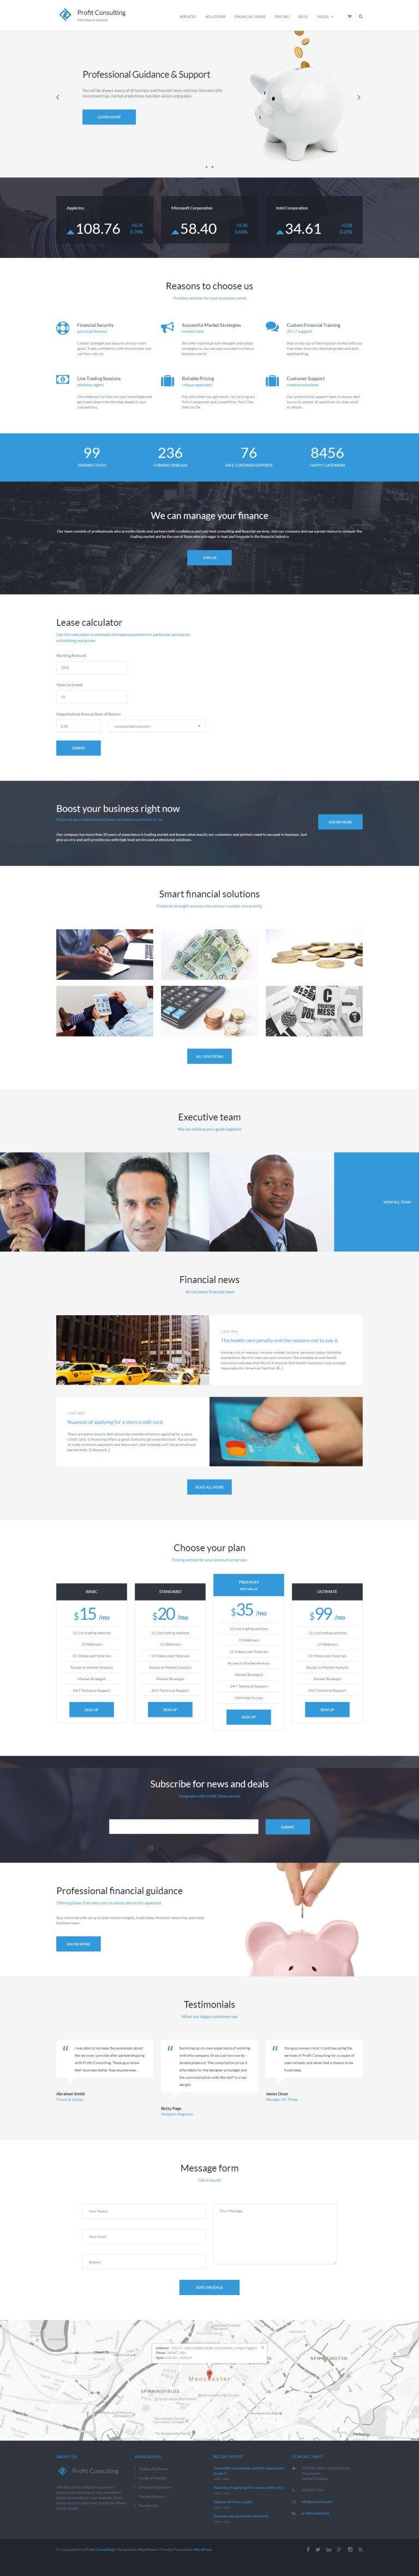 Profit Consulting - Financial Advisor WordPress Theme New Screenshots BIG